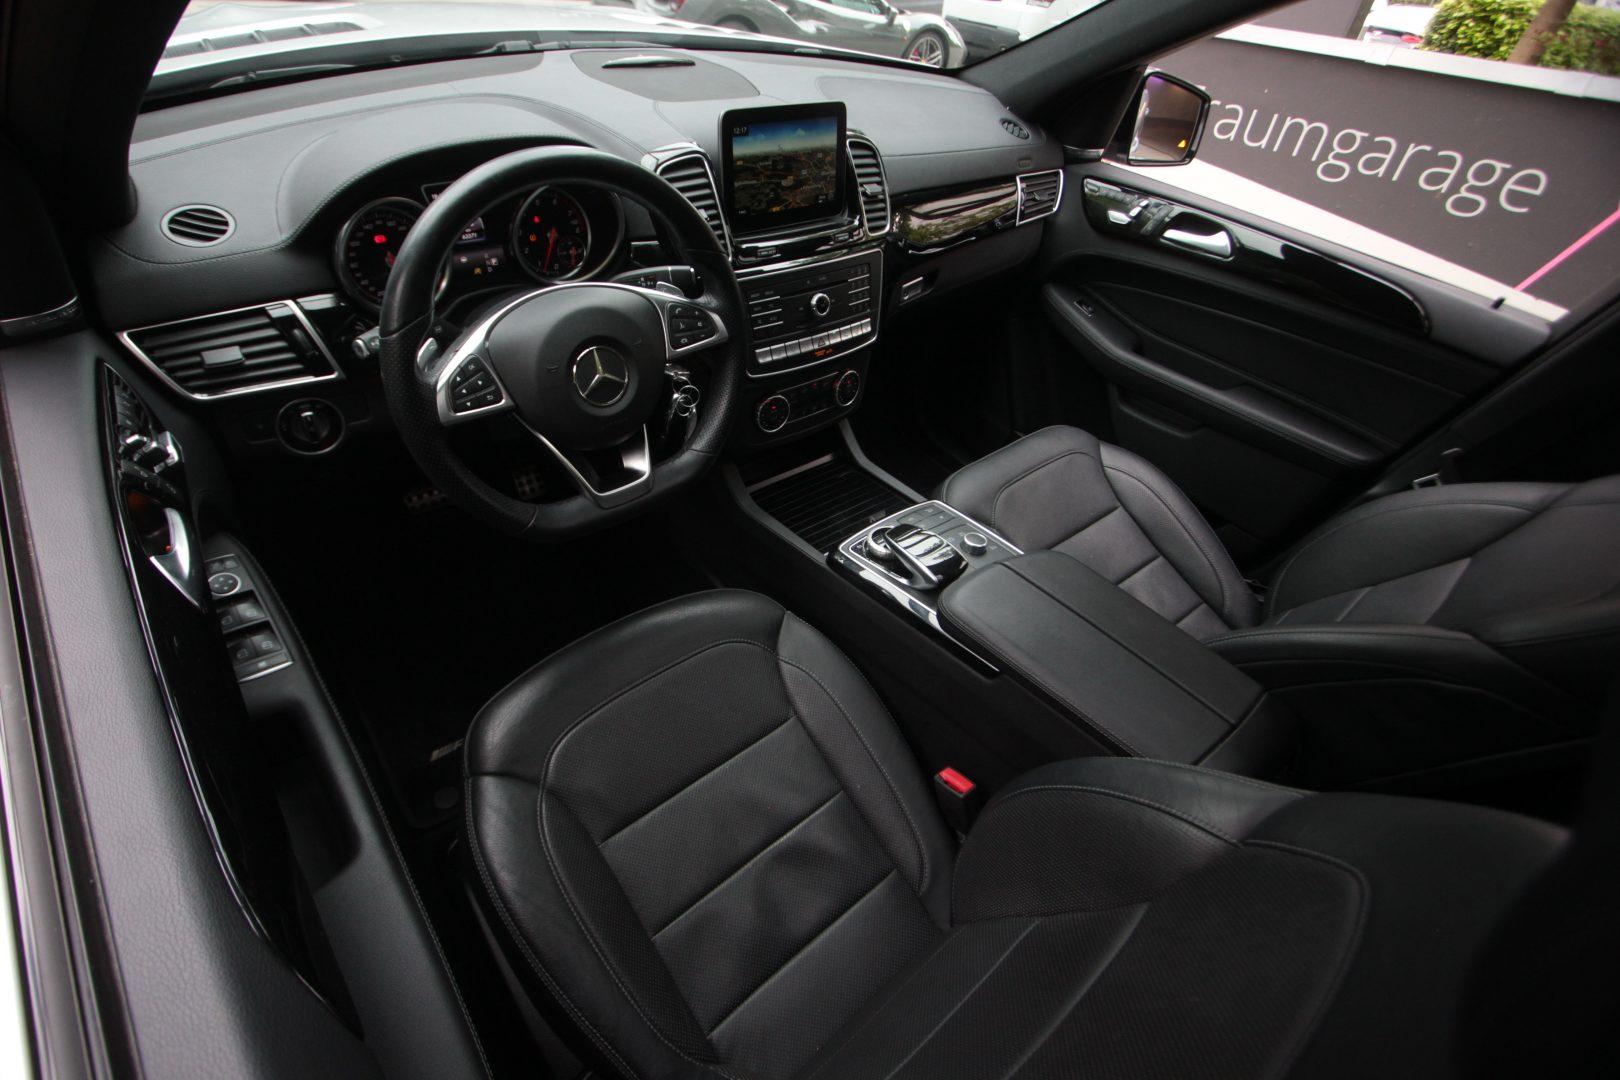 AIL Mercedes-Benz GLE 450 AMG 4Matic 9